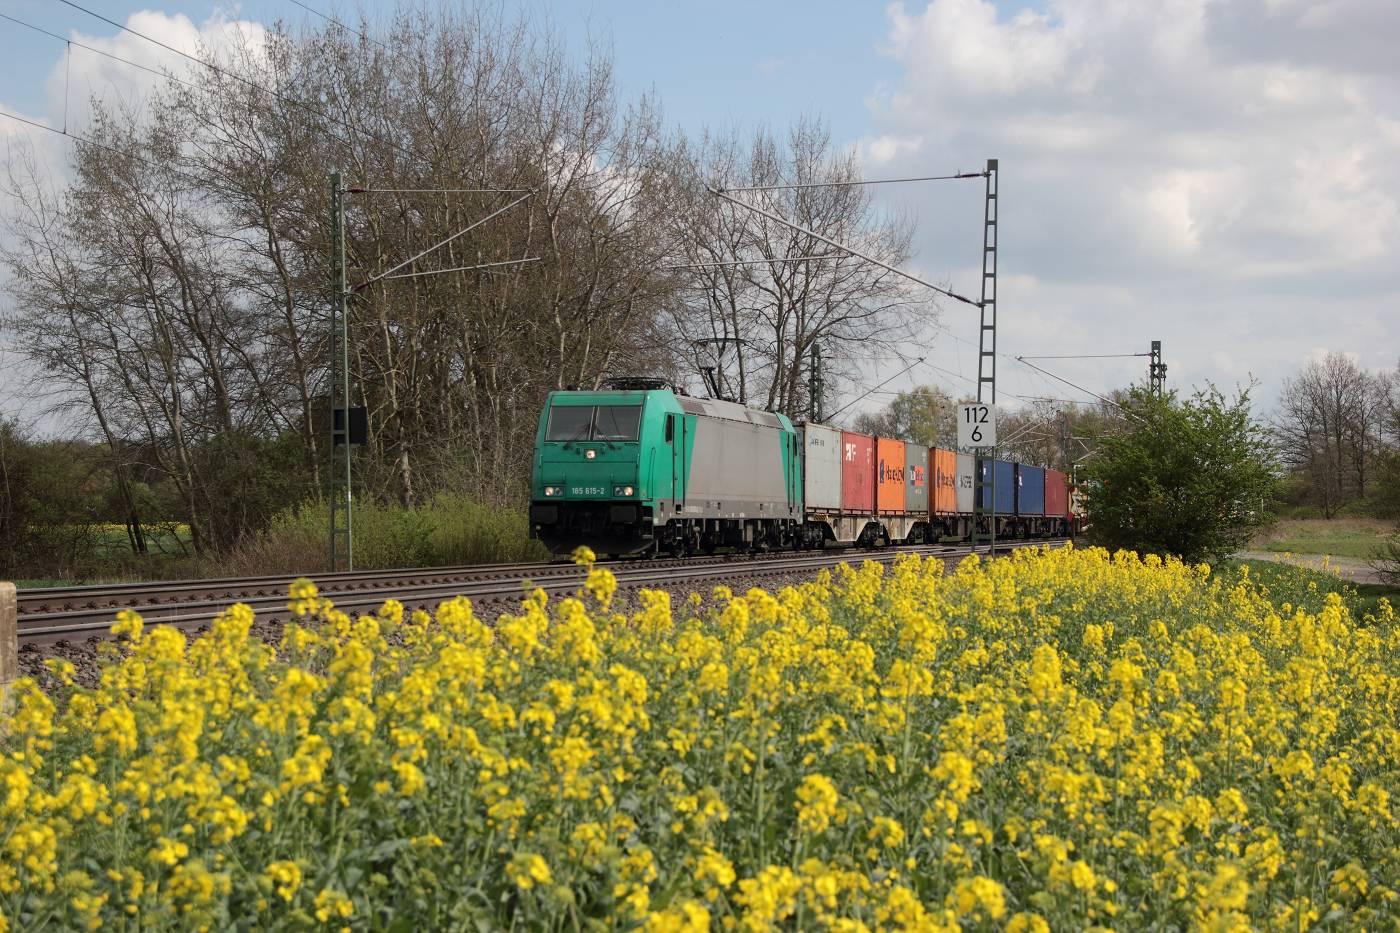 http://www.nachtbahner.de/fotos/2014-04-11%20Hochbetrieb%20in%20HB-Mahndorf/k-IMG_2805%20Mahndorfer%20Raps%20%288%29.JPG